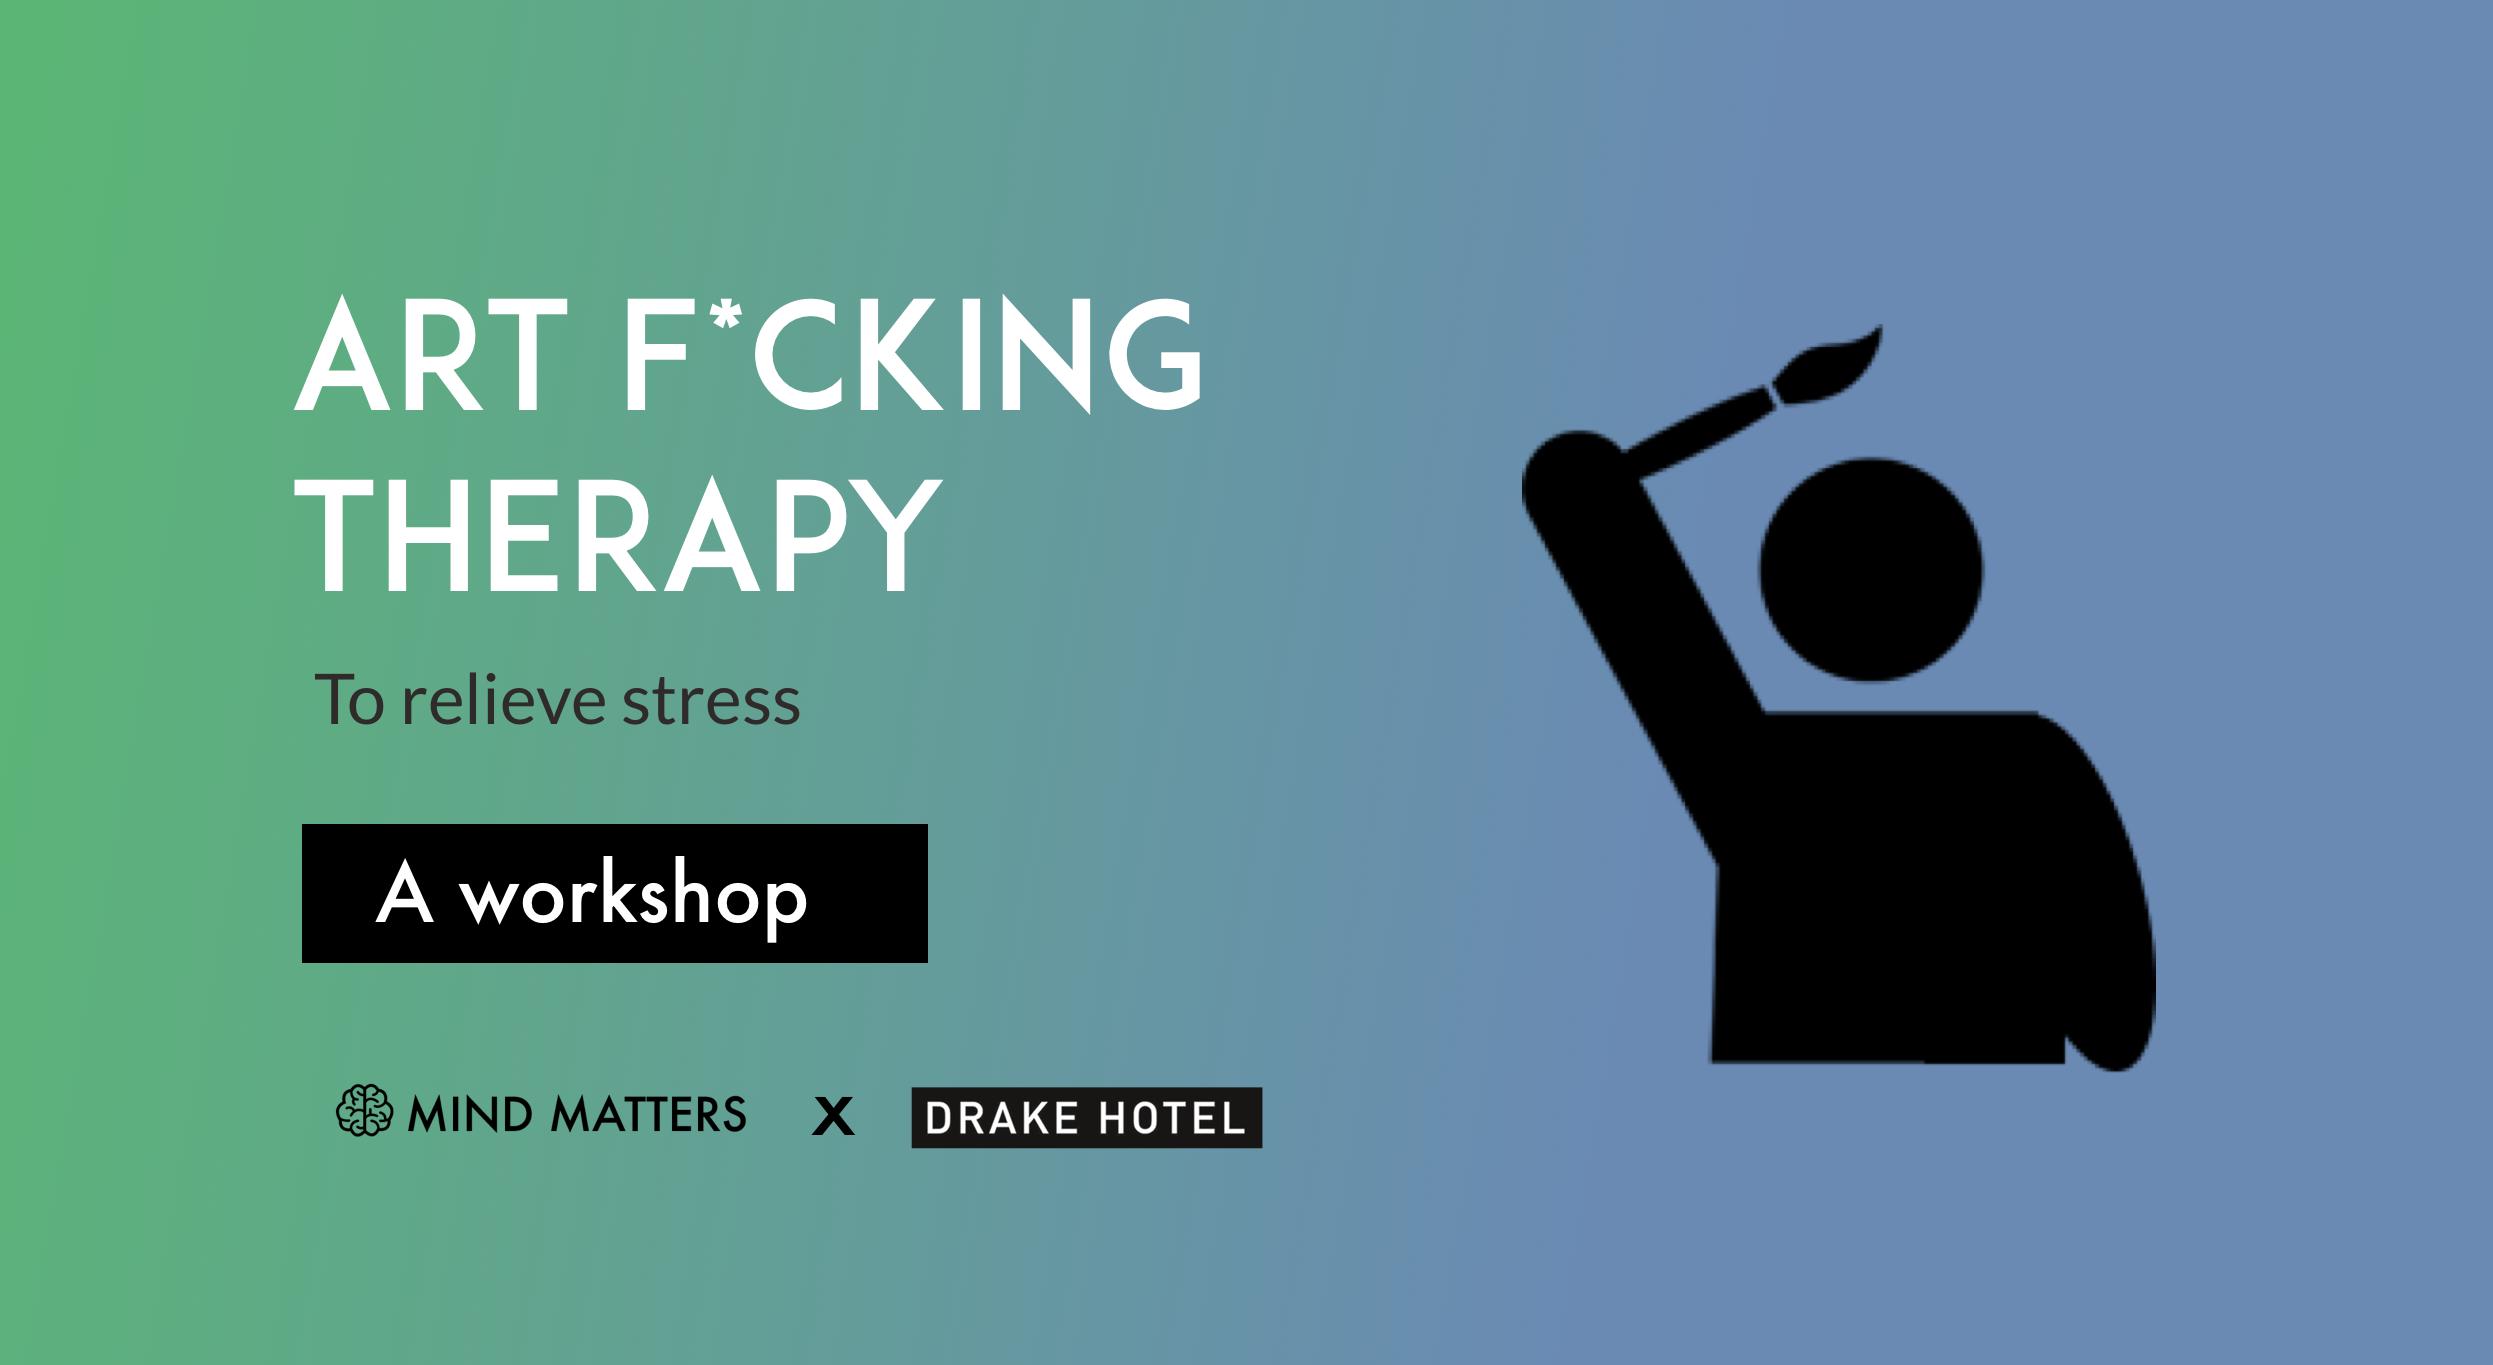 Facebook Art F*cking Therapy Facebook.jpg